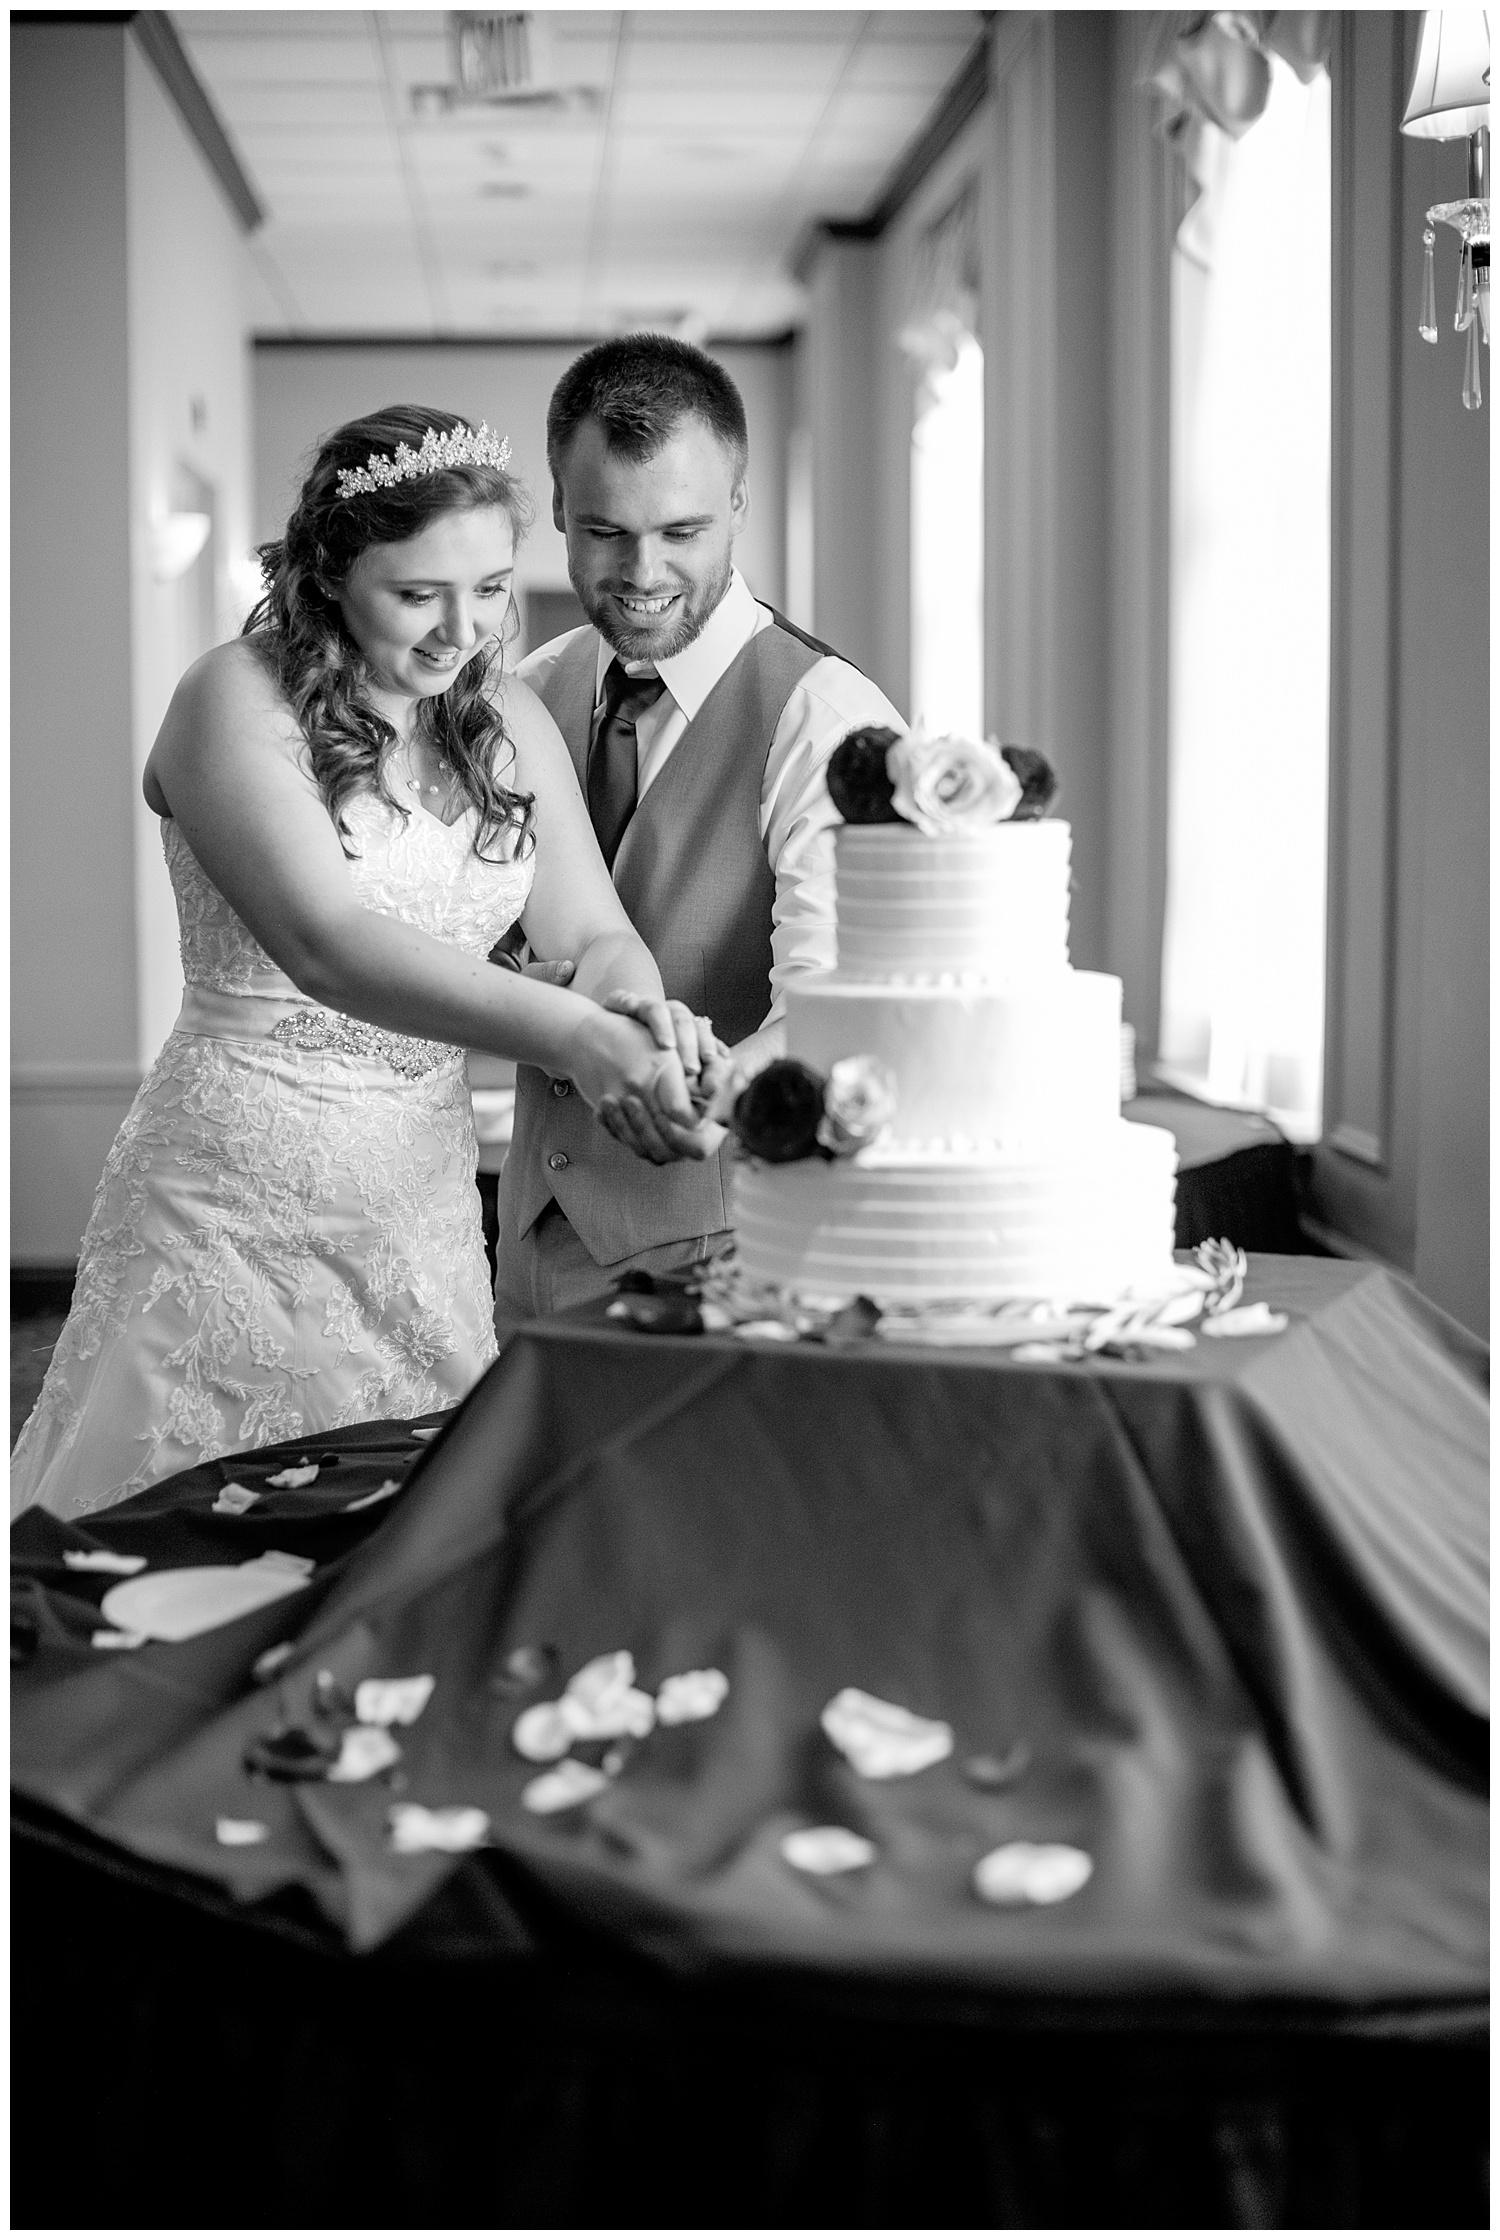 TheSmythCollective-Best-Cincinnati-Wedding-Photographer-Urban-Downtown-Covington-Wedding-27.jpg